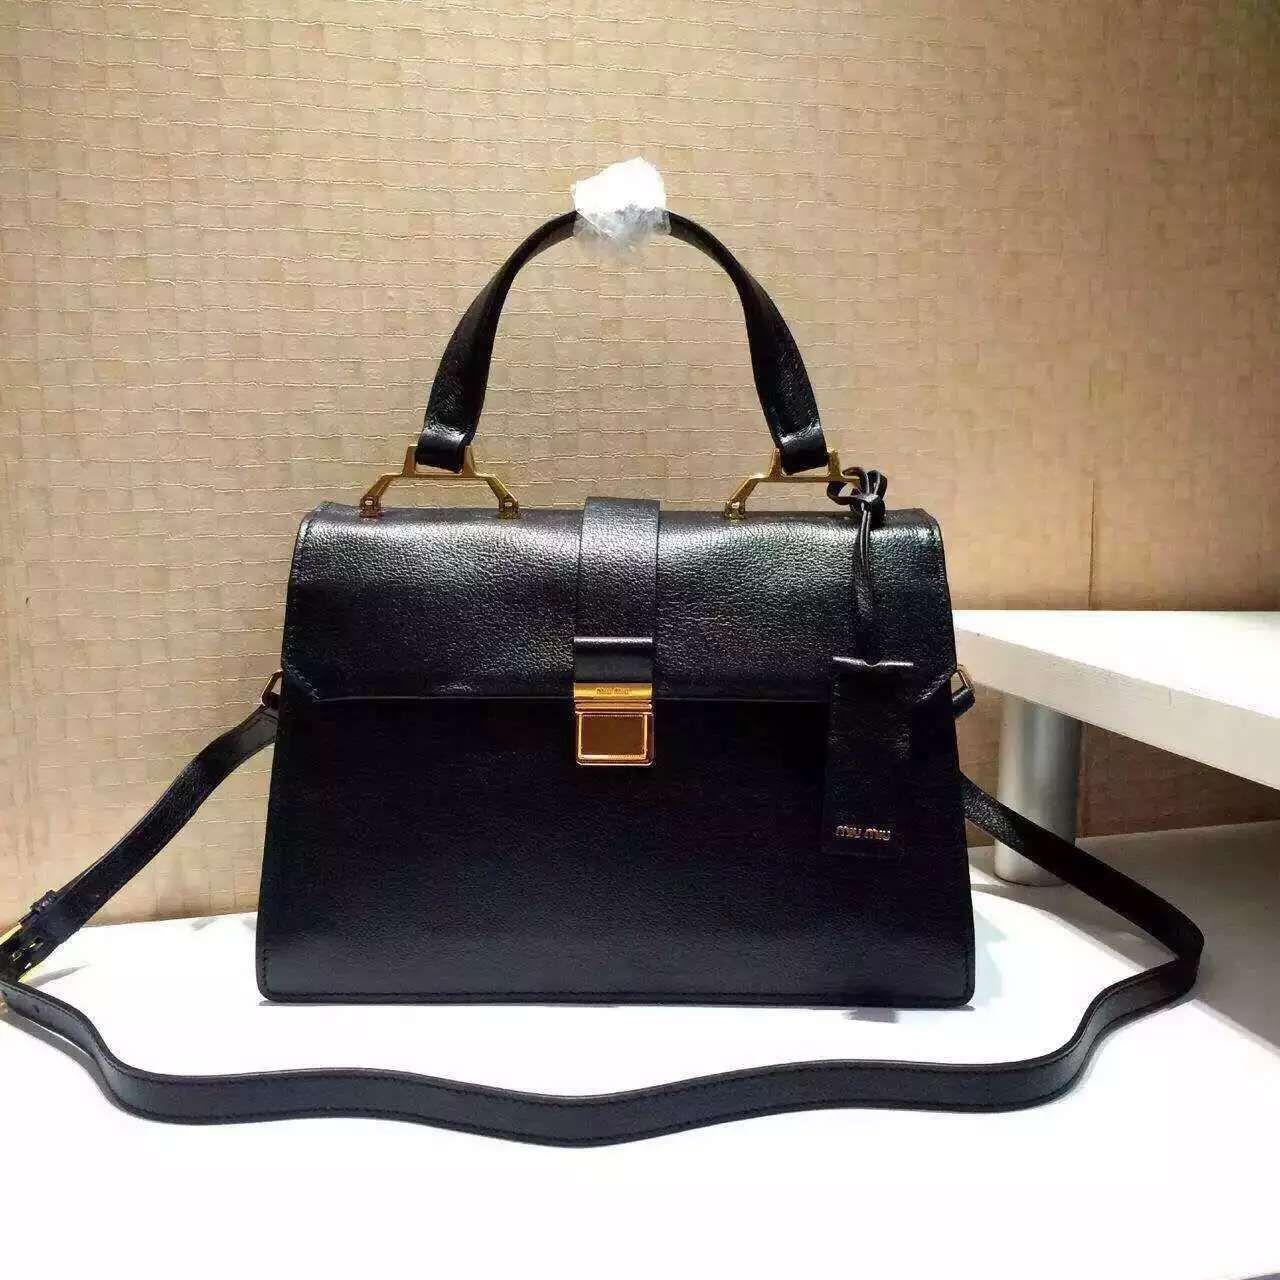 Miu Miu Bags Sale Online